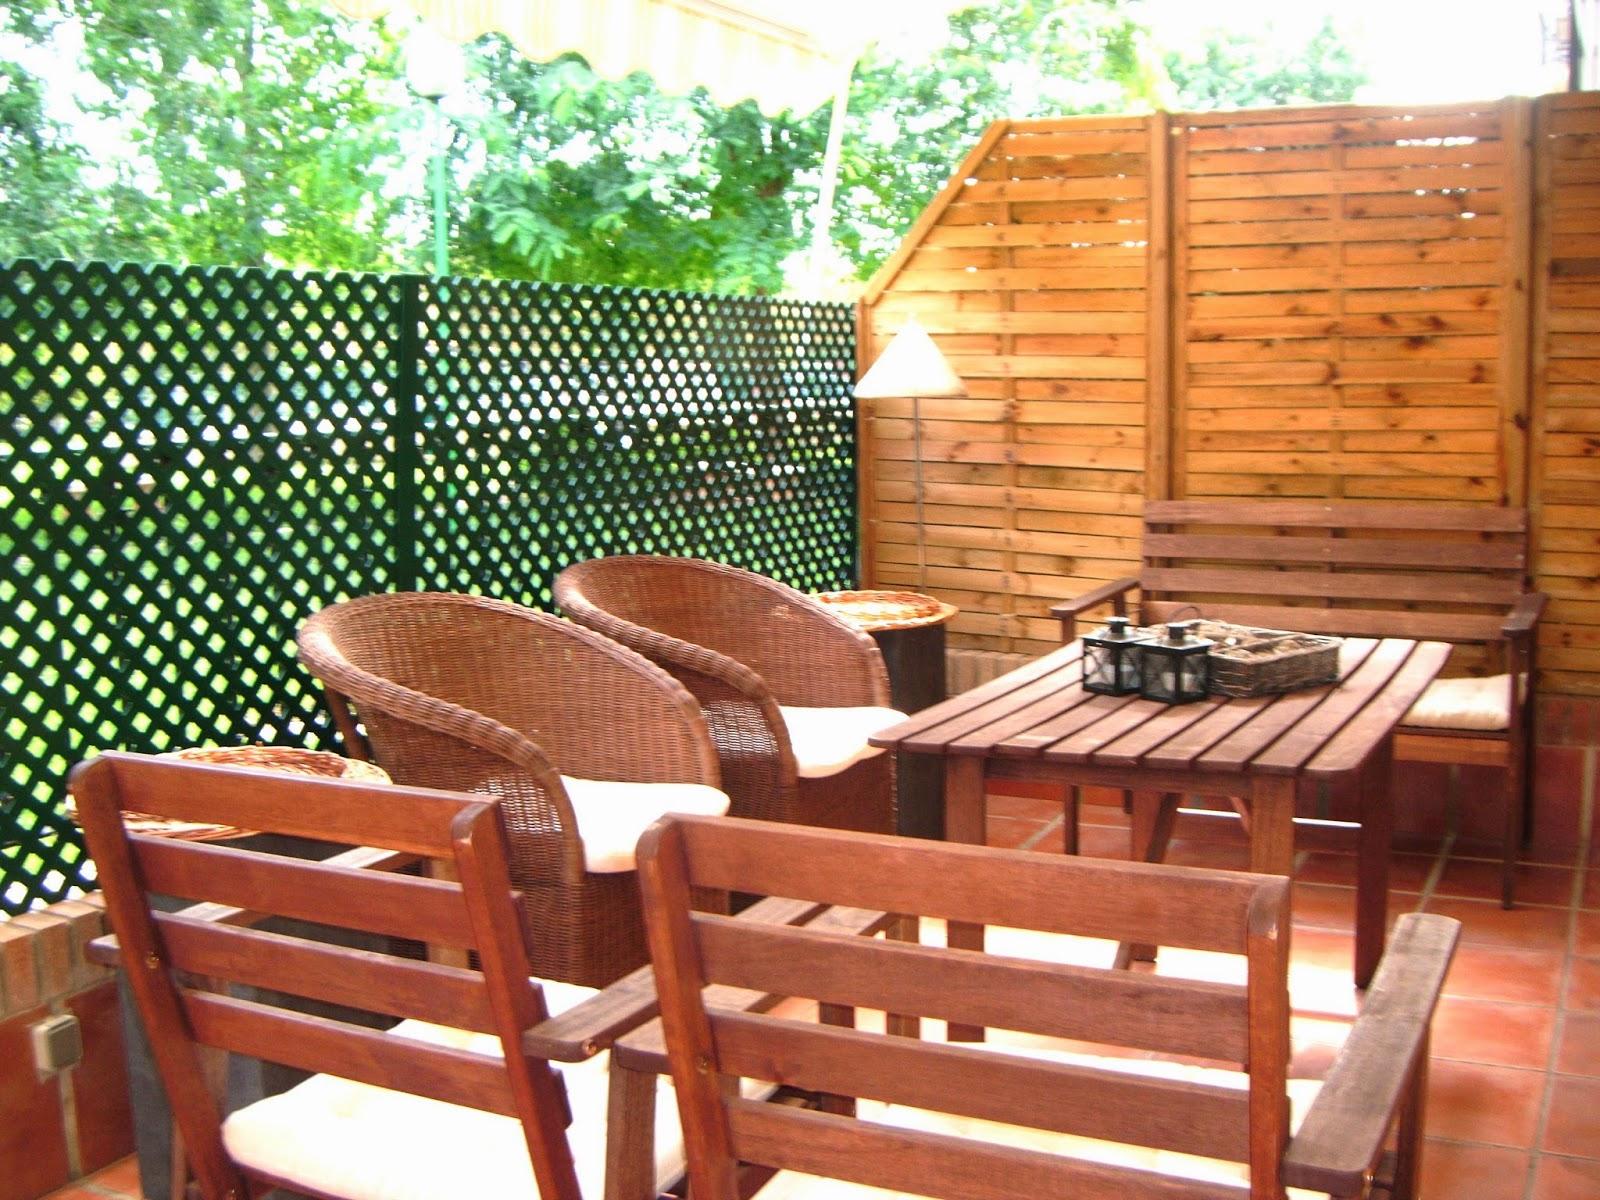 Azulcasinegro ikea valencia un sue o hecho realidad for Conjunto terraza ikea